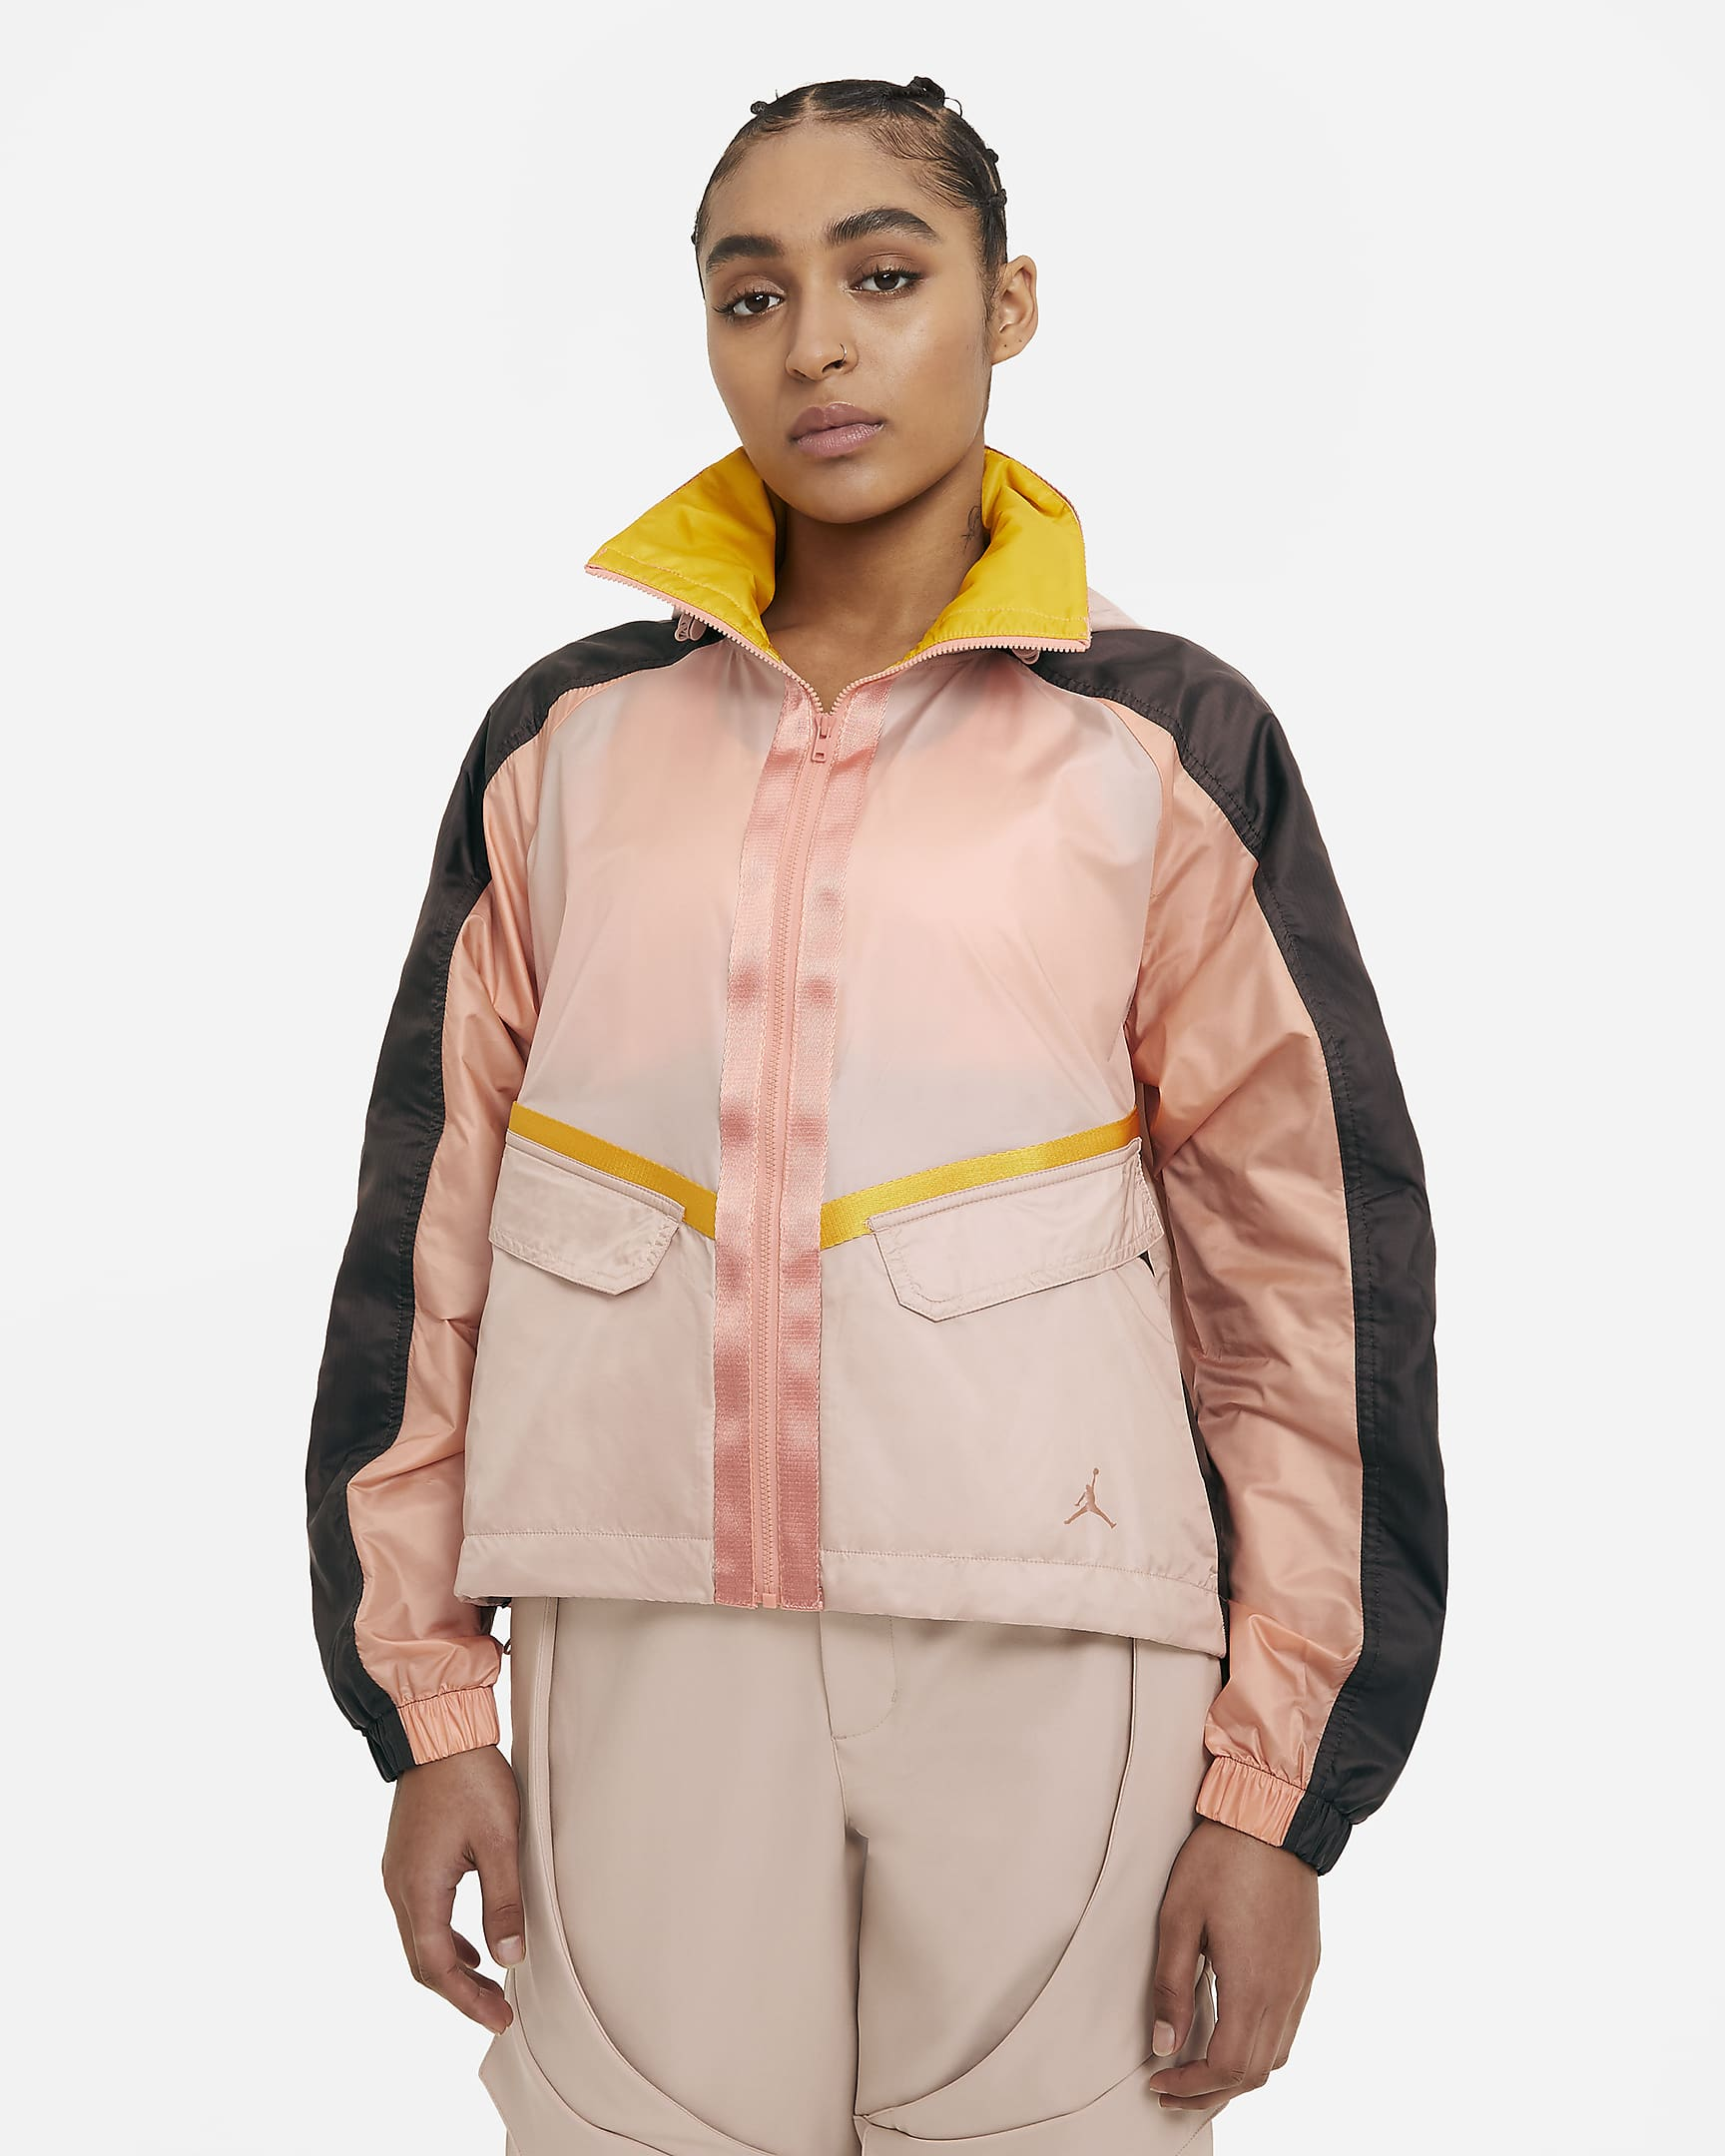 jordan-future-primal-womens-lightweight-jacket-S7Cnt0